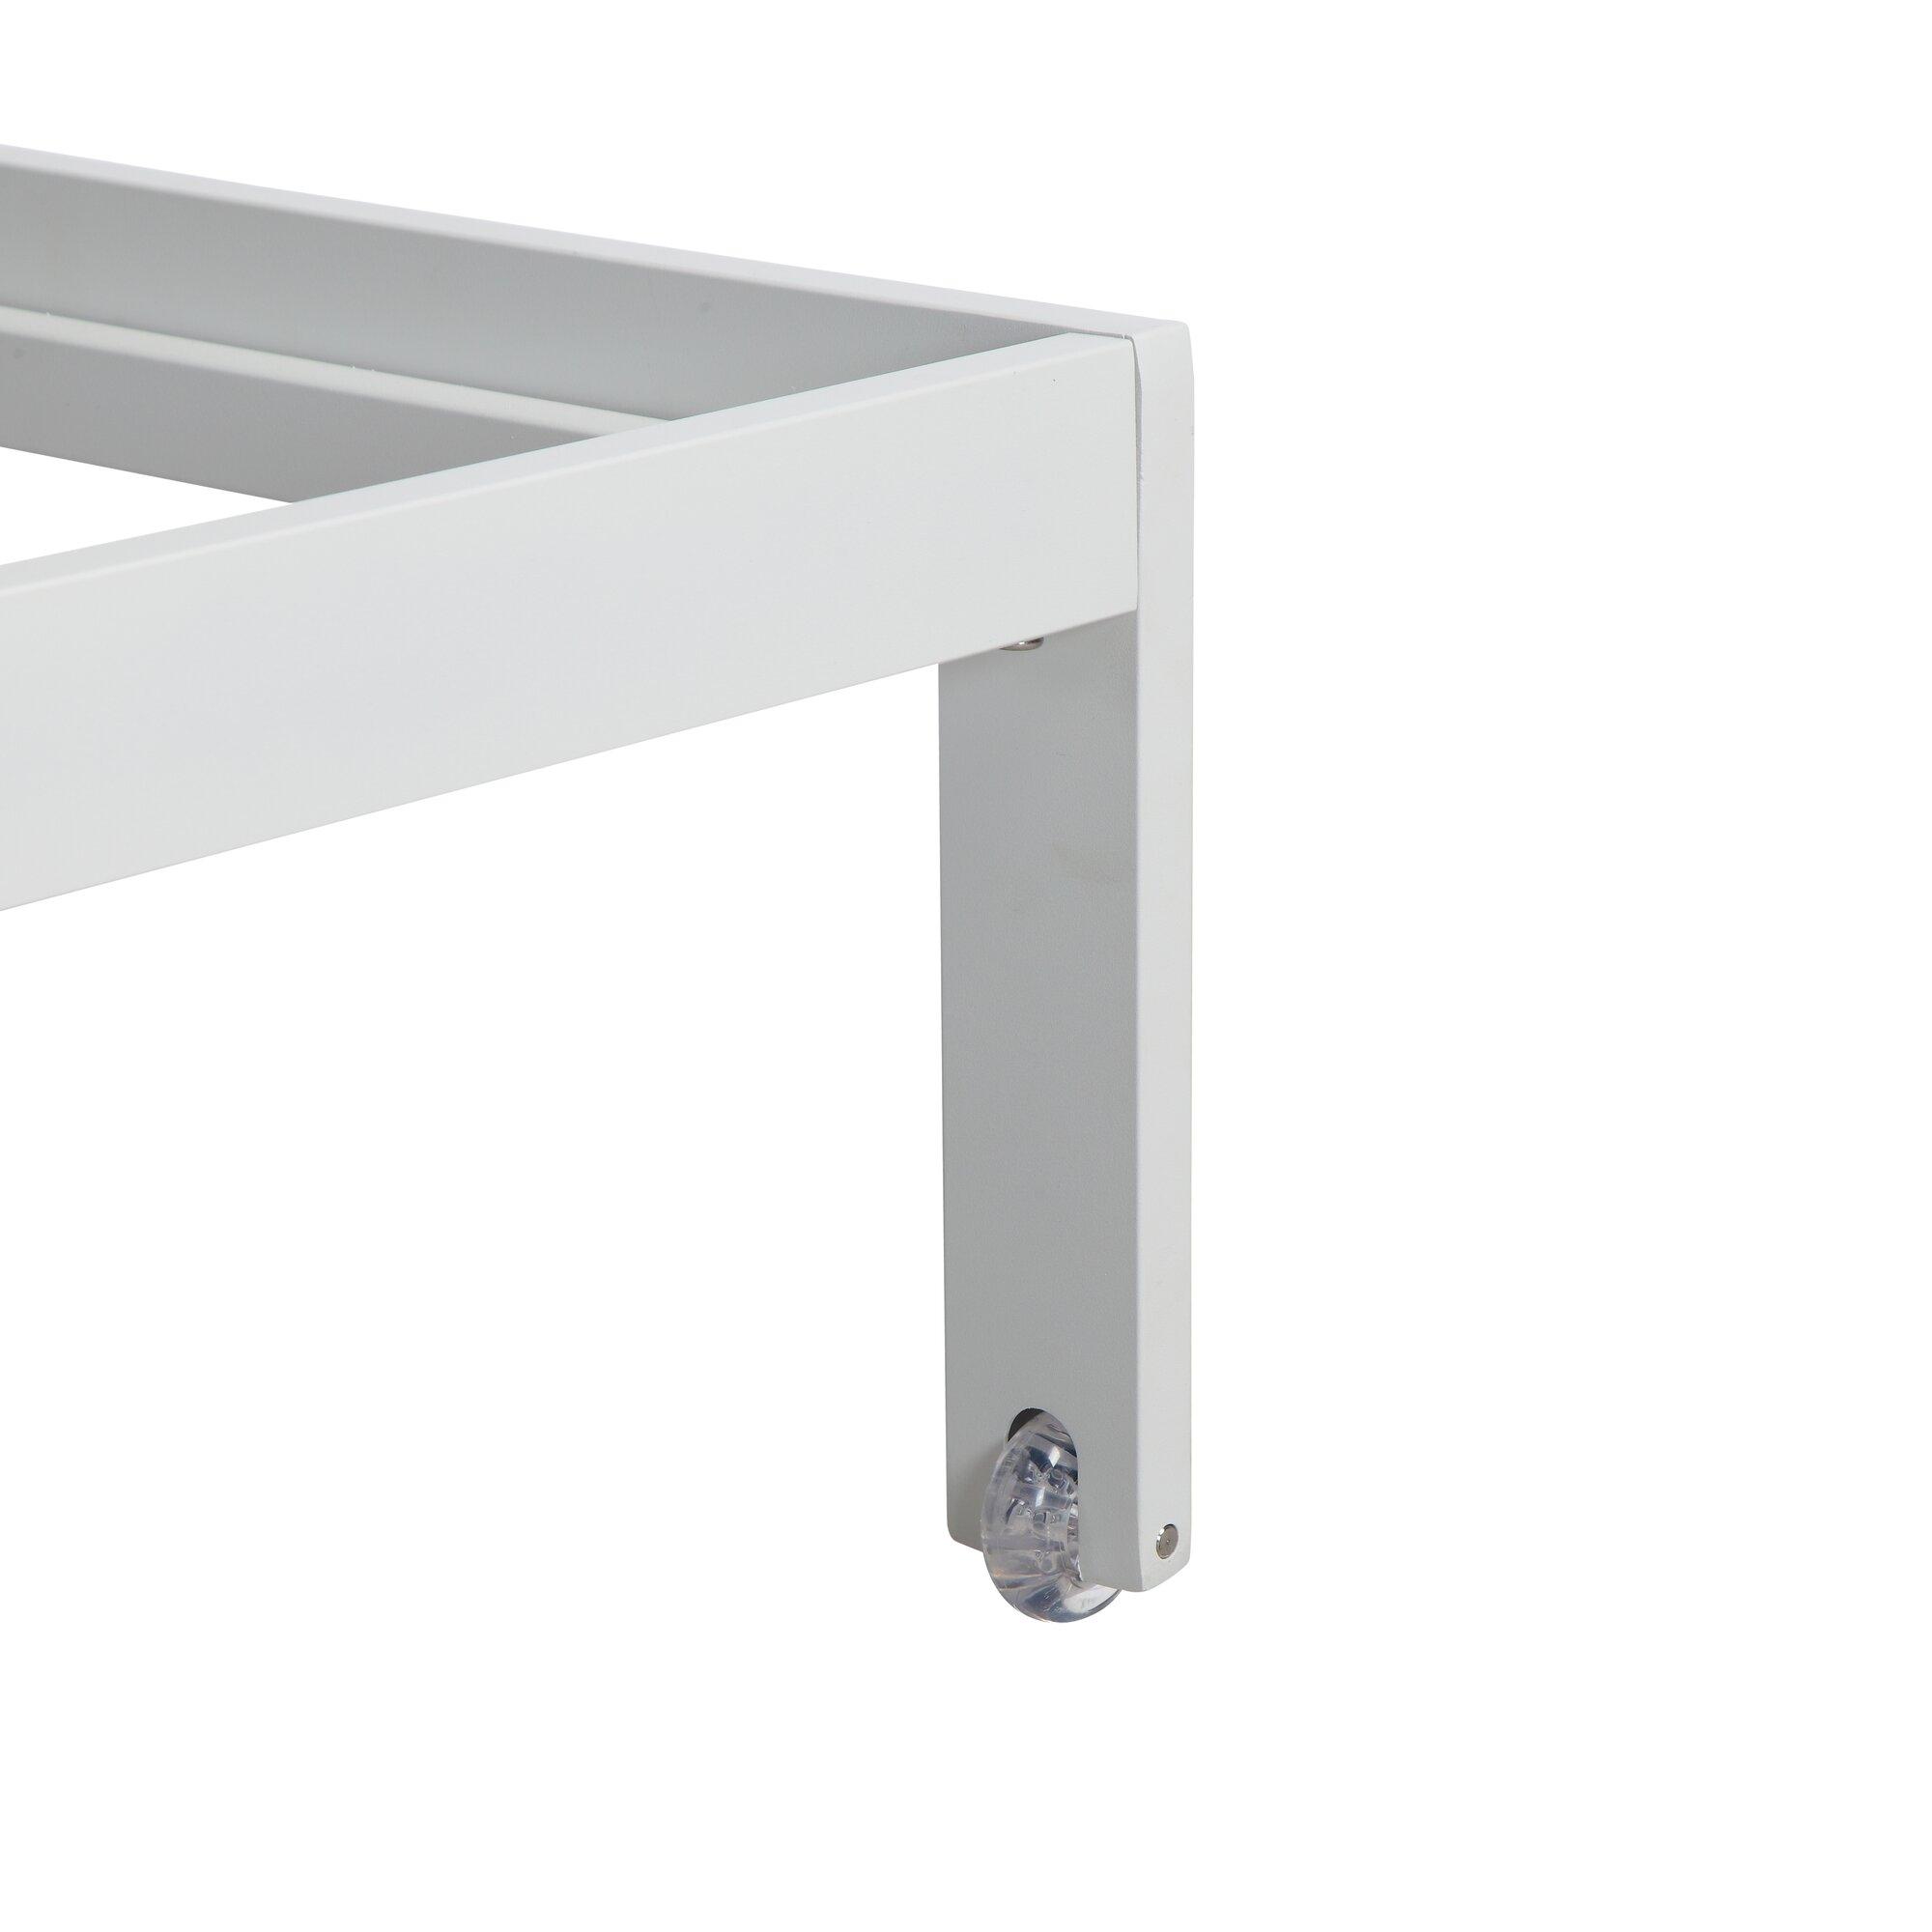 Belterra aluminum frame chaise lounge reviews birch lane for Aluminum frame chaise lounge